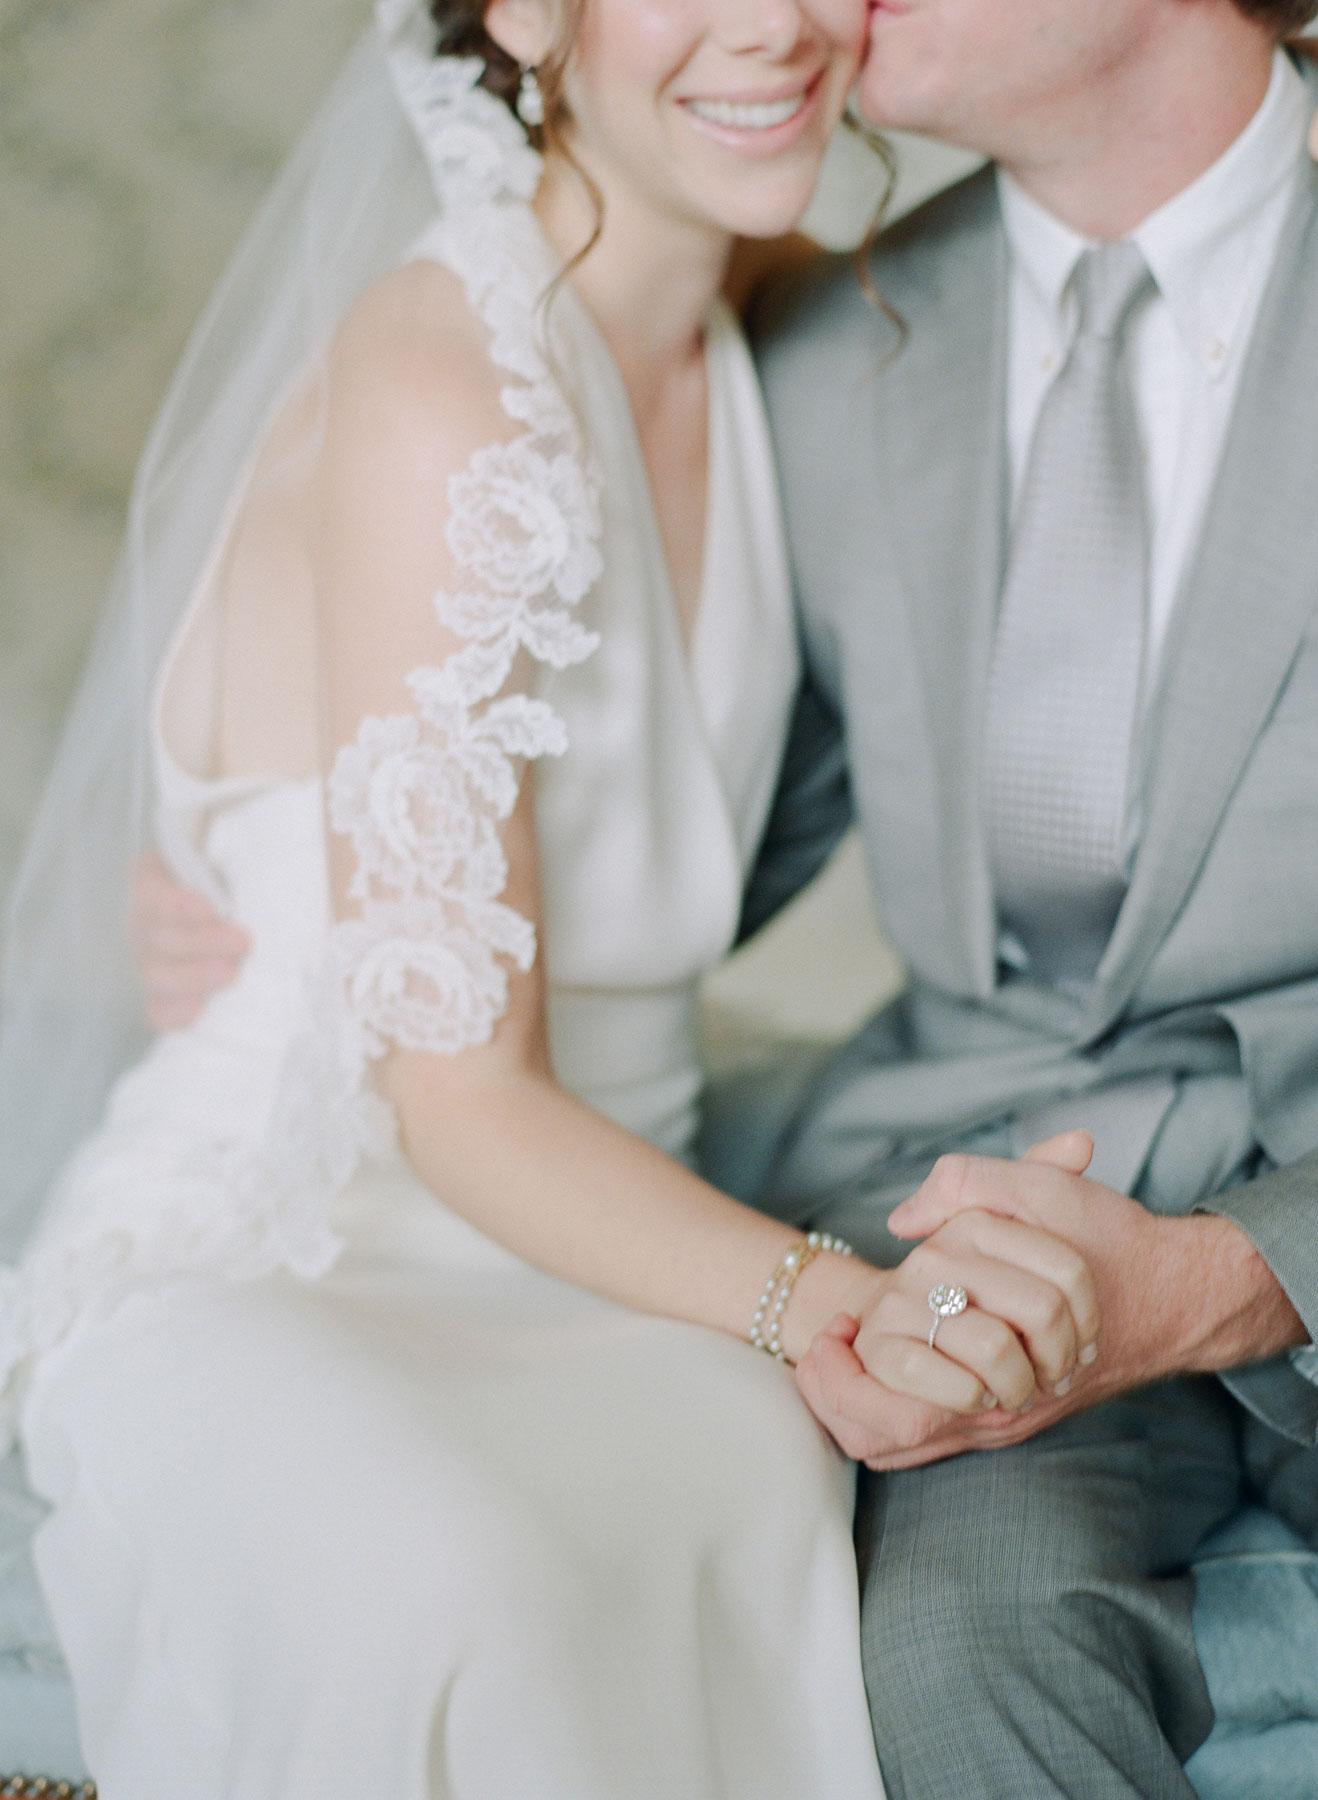 Wedding Color Palette: 16 Grey Wedding Décor Ideas - Inside Weddings